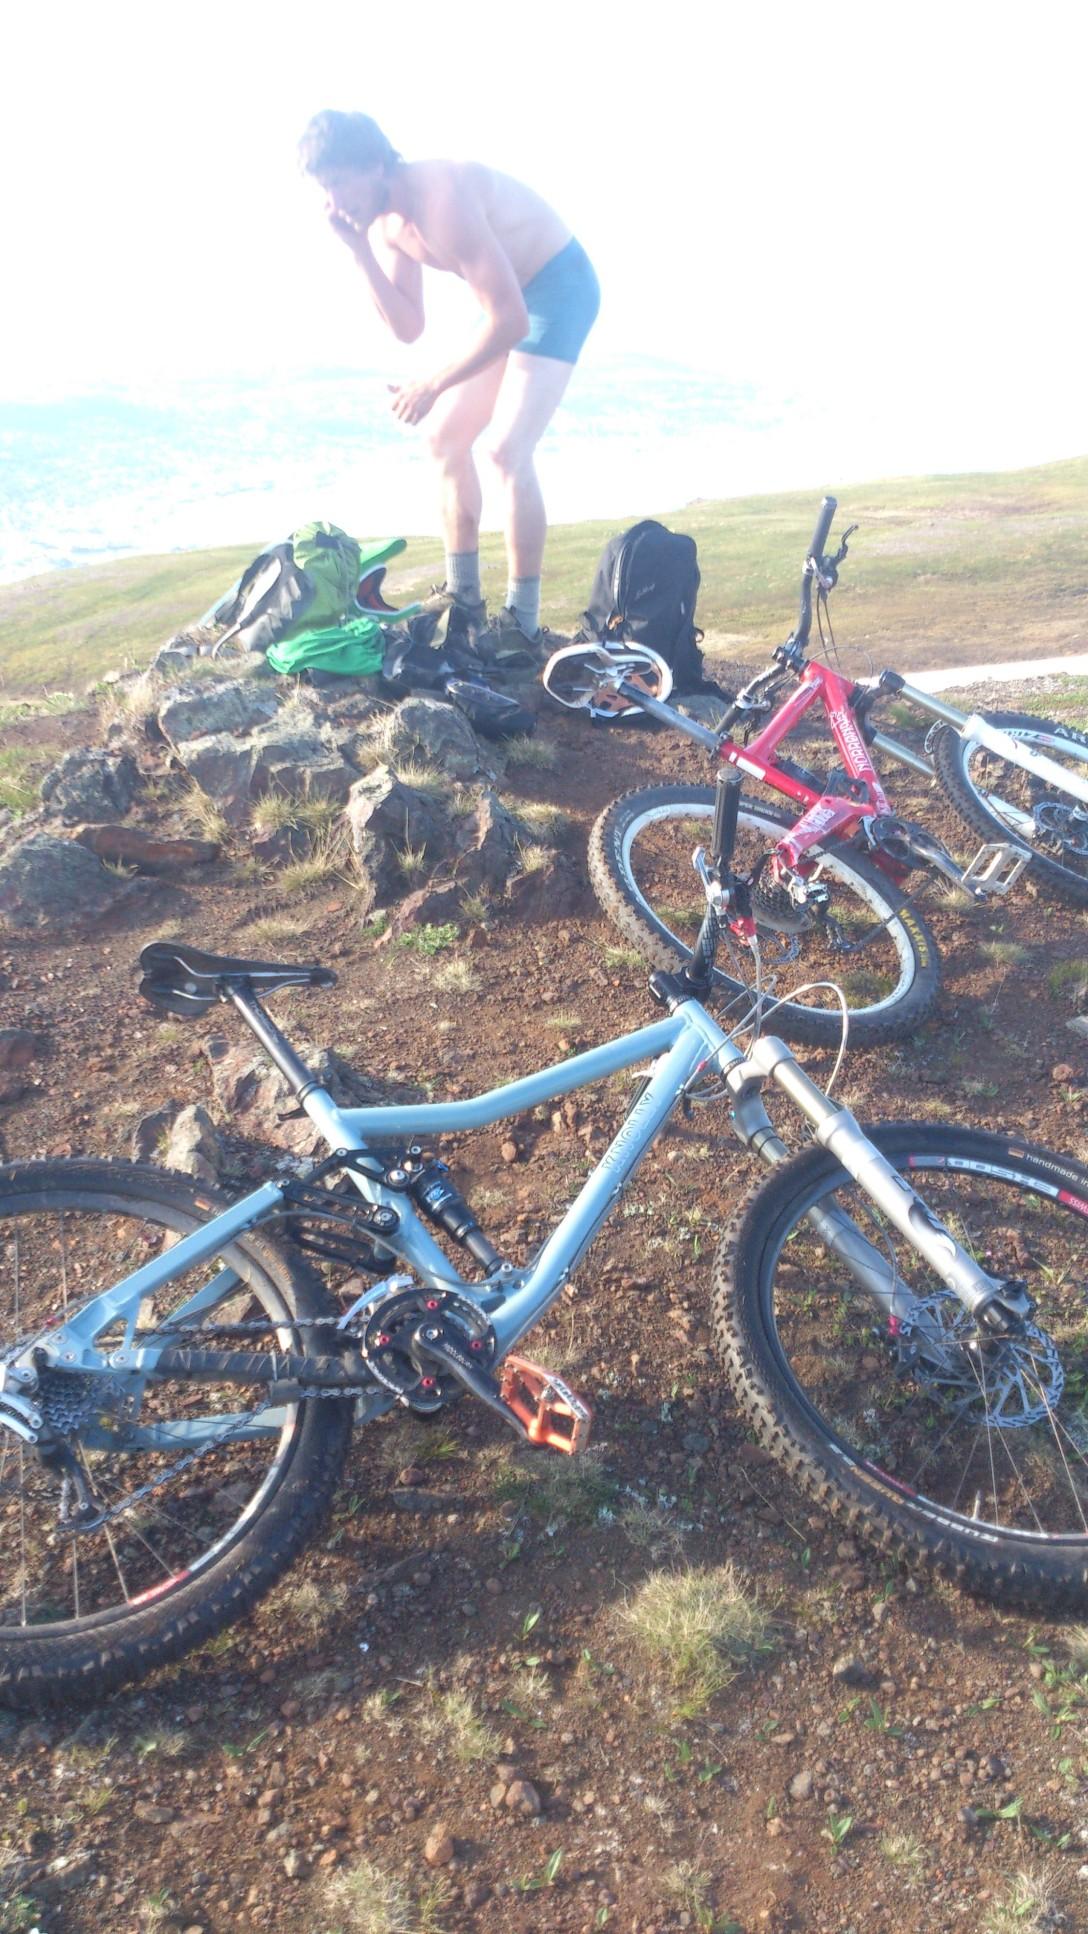 testing trails